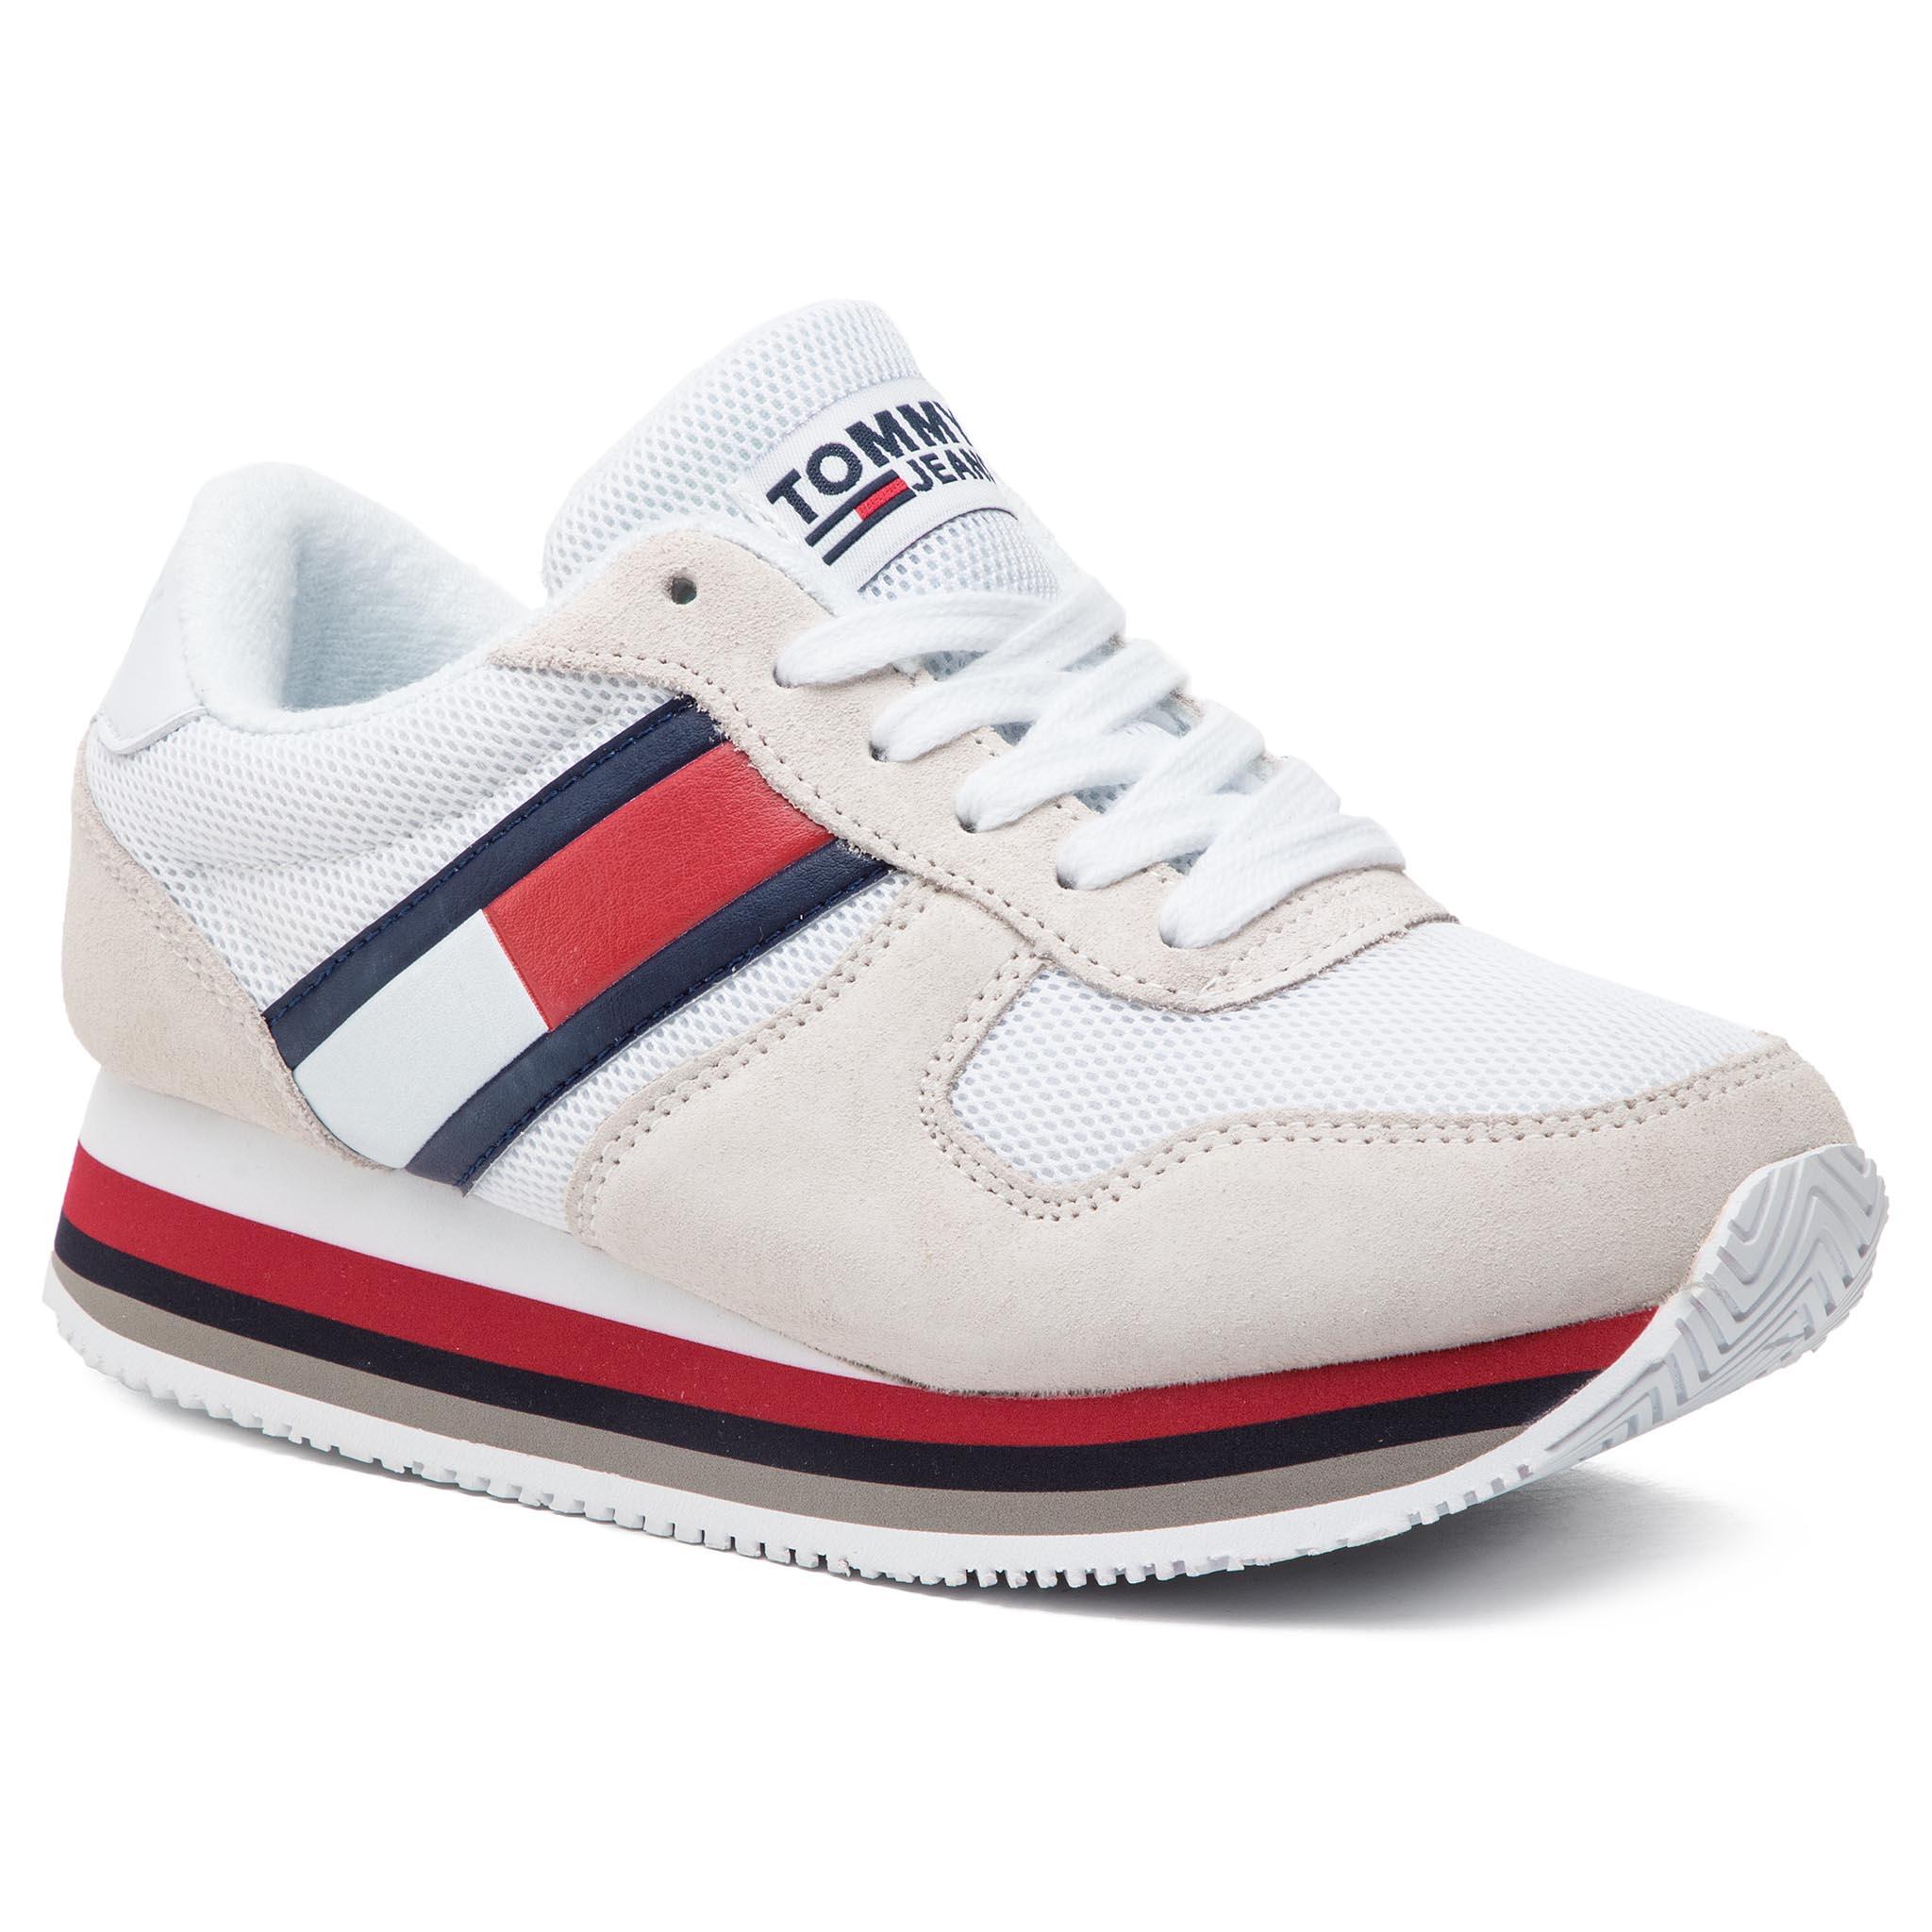 Jeans Sneaker Rwb Retro Sneakers 020 Tommy Casual Em0em00112 y7fYb6g